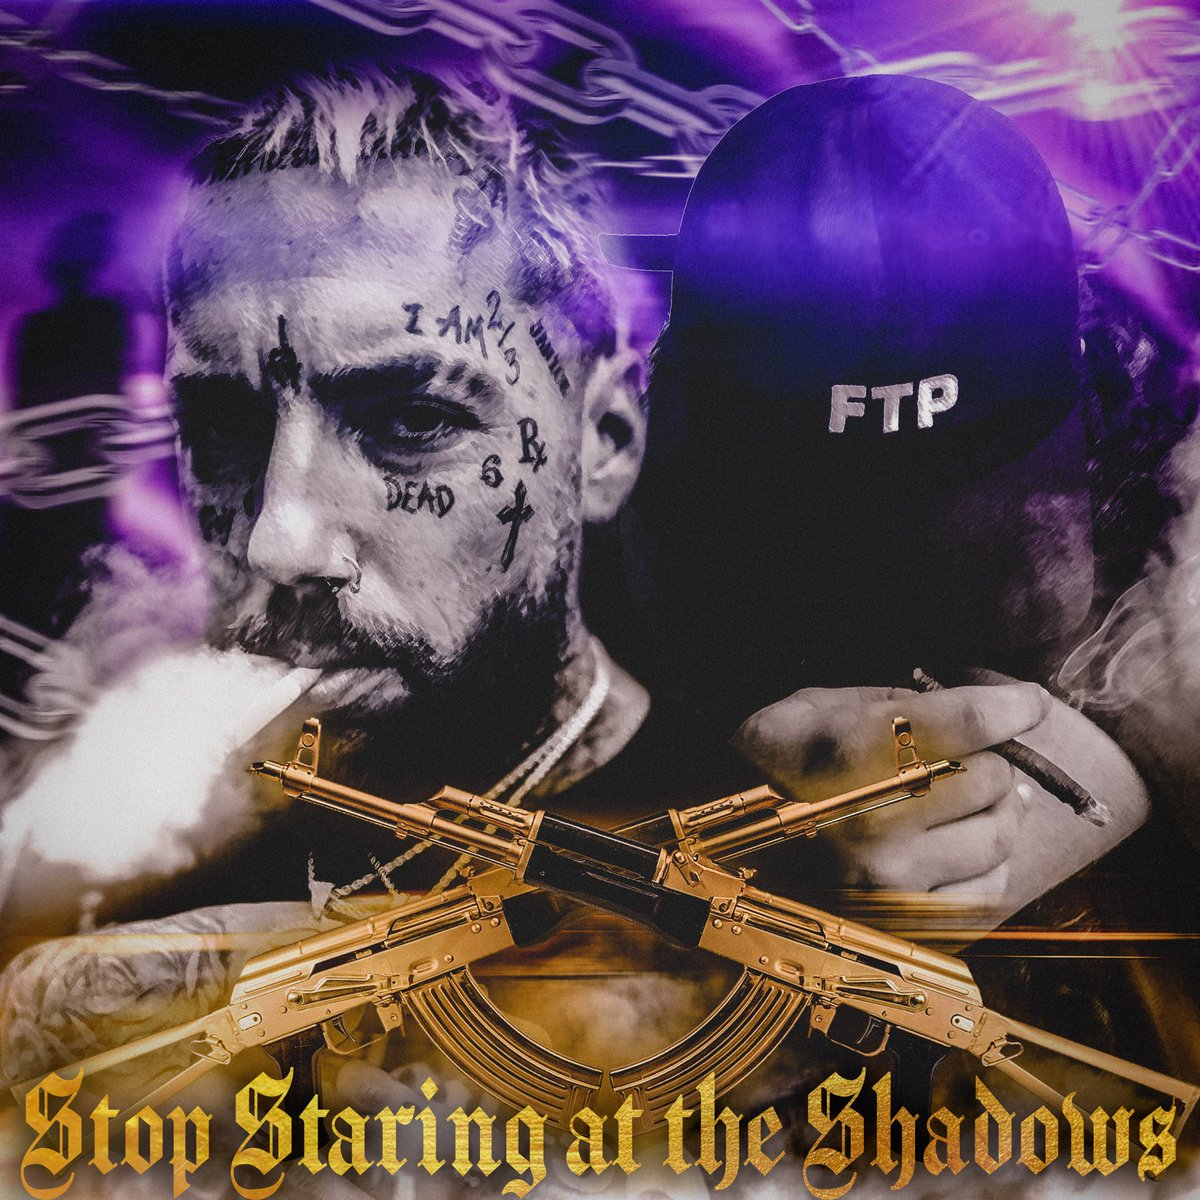 @SuicideChrist @suicideLEOPARD @SUICIDEBOYS  Stop staring at the shadows🔥  #suicideboys #grey59 #stopstaringattheshadows #scrim #rubythecherry